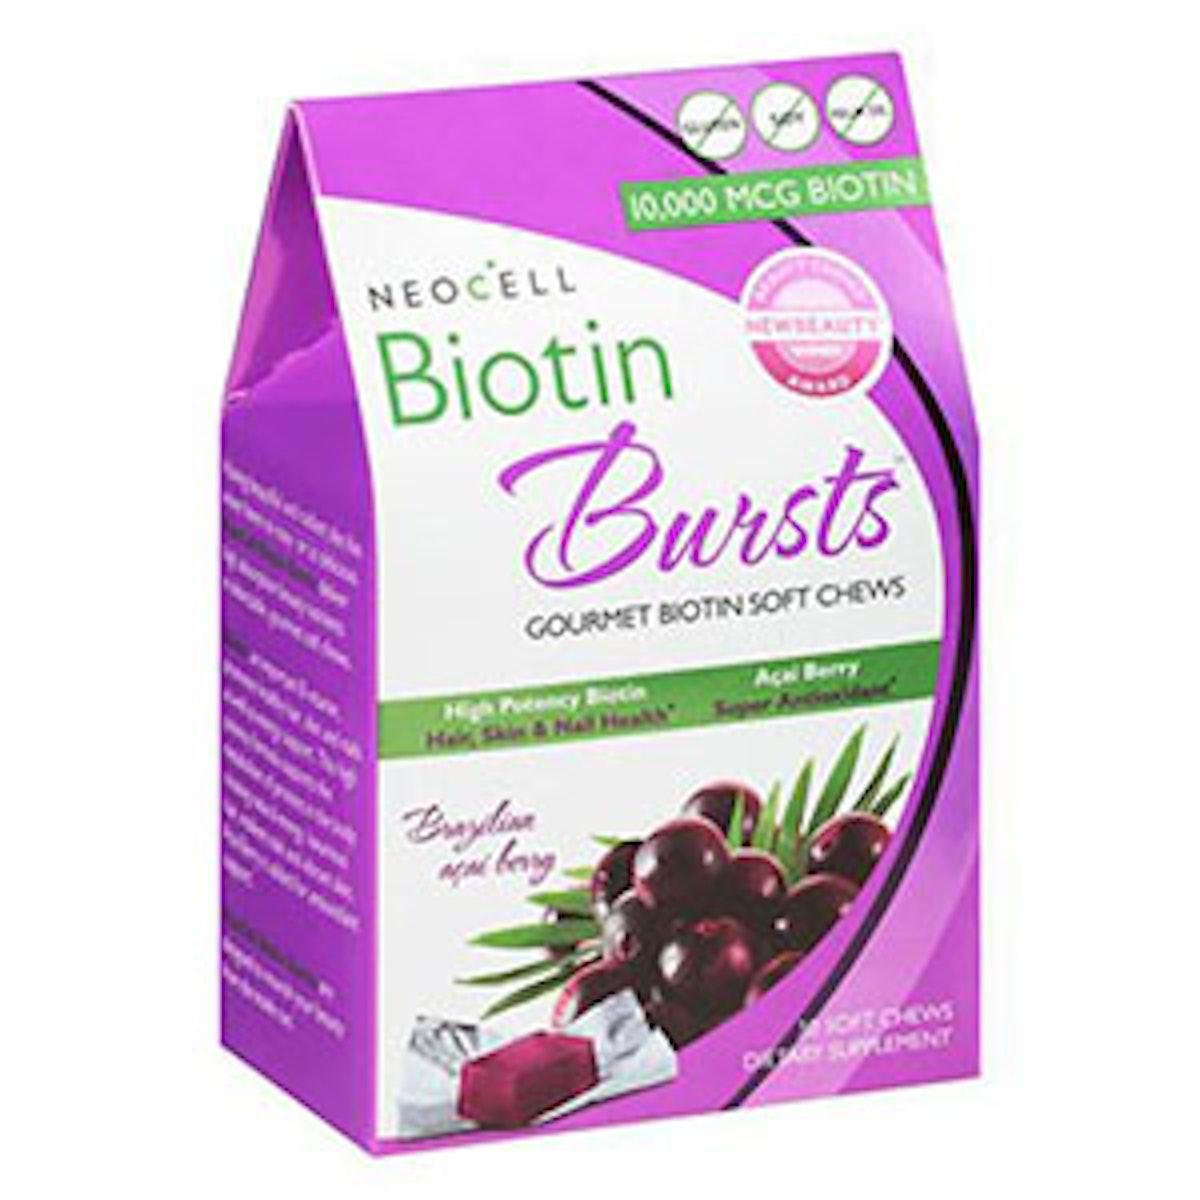 Biotin Bursts Gourmet Biotin Soft Chews